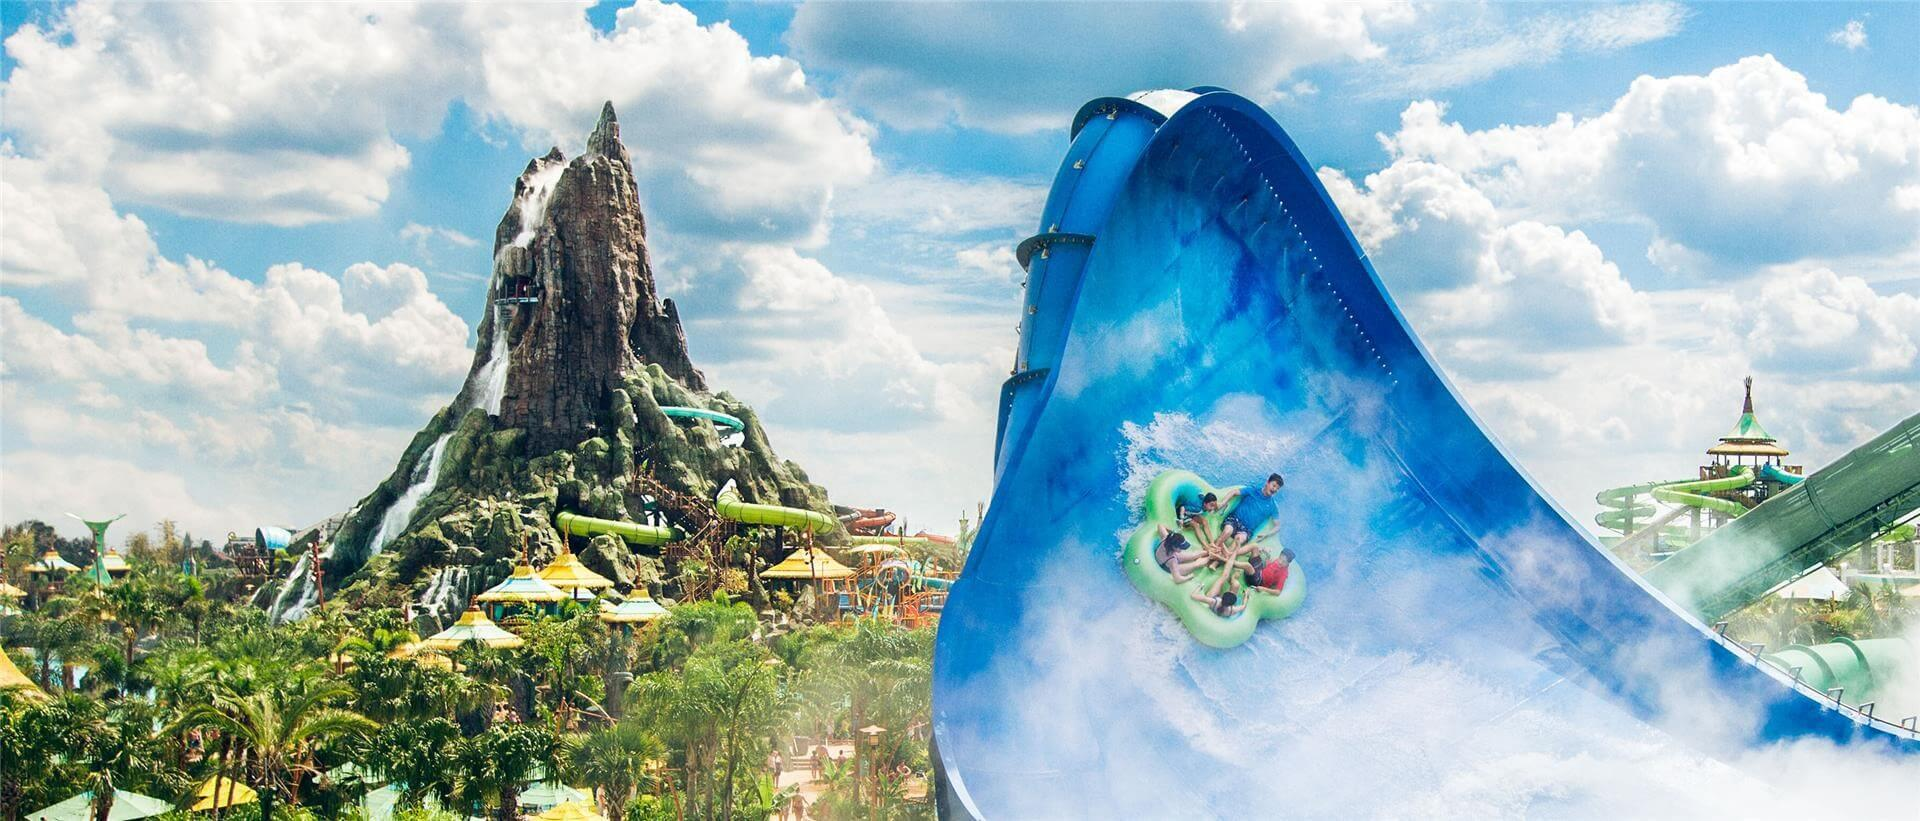 Universal S Volcano Bay Water Theme Park Universal